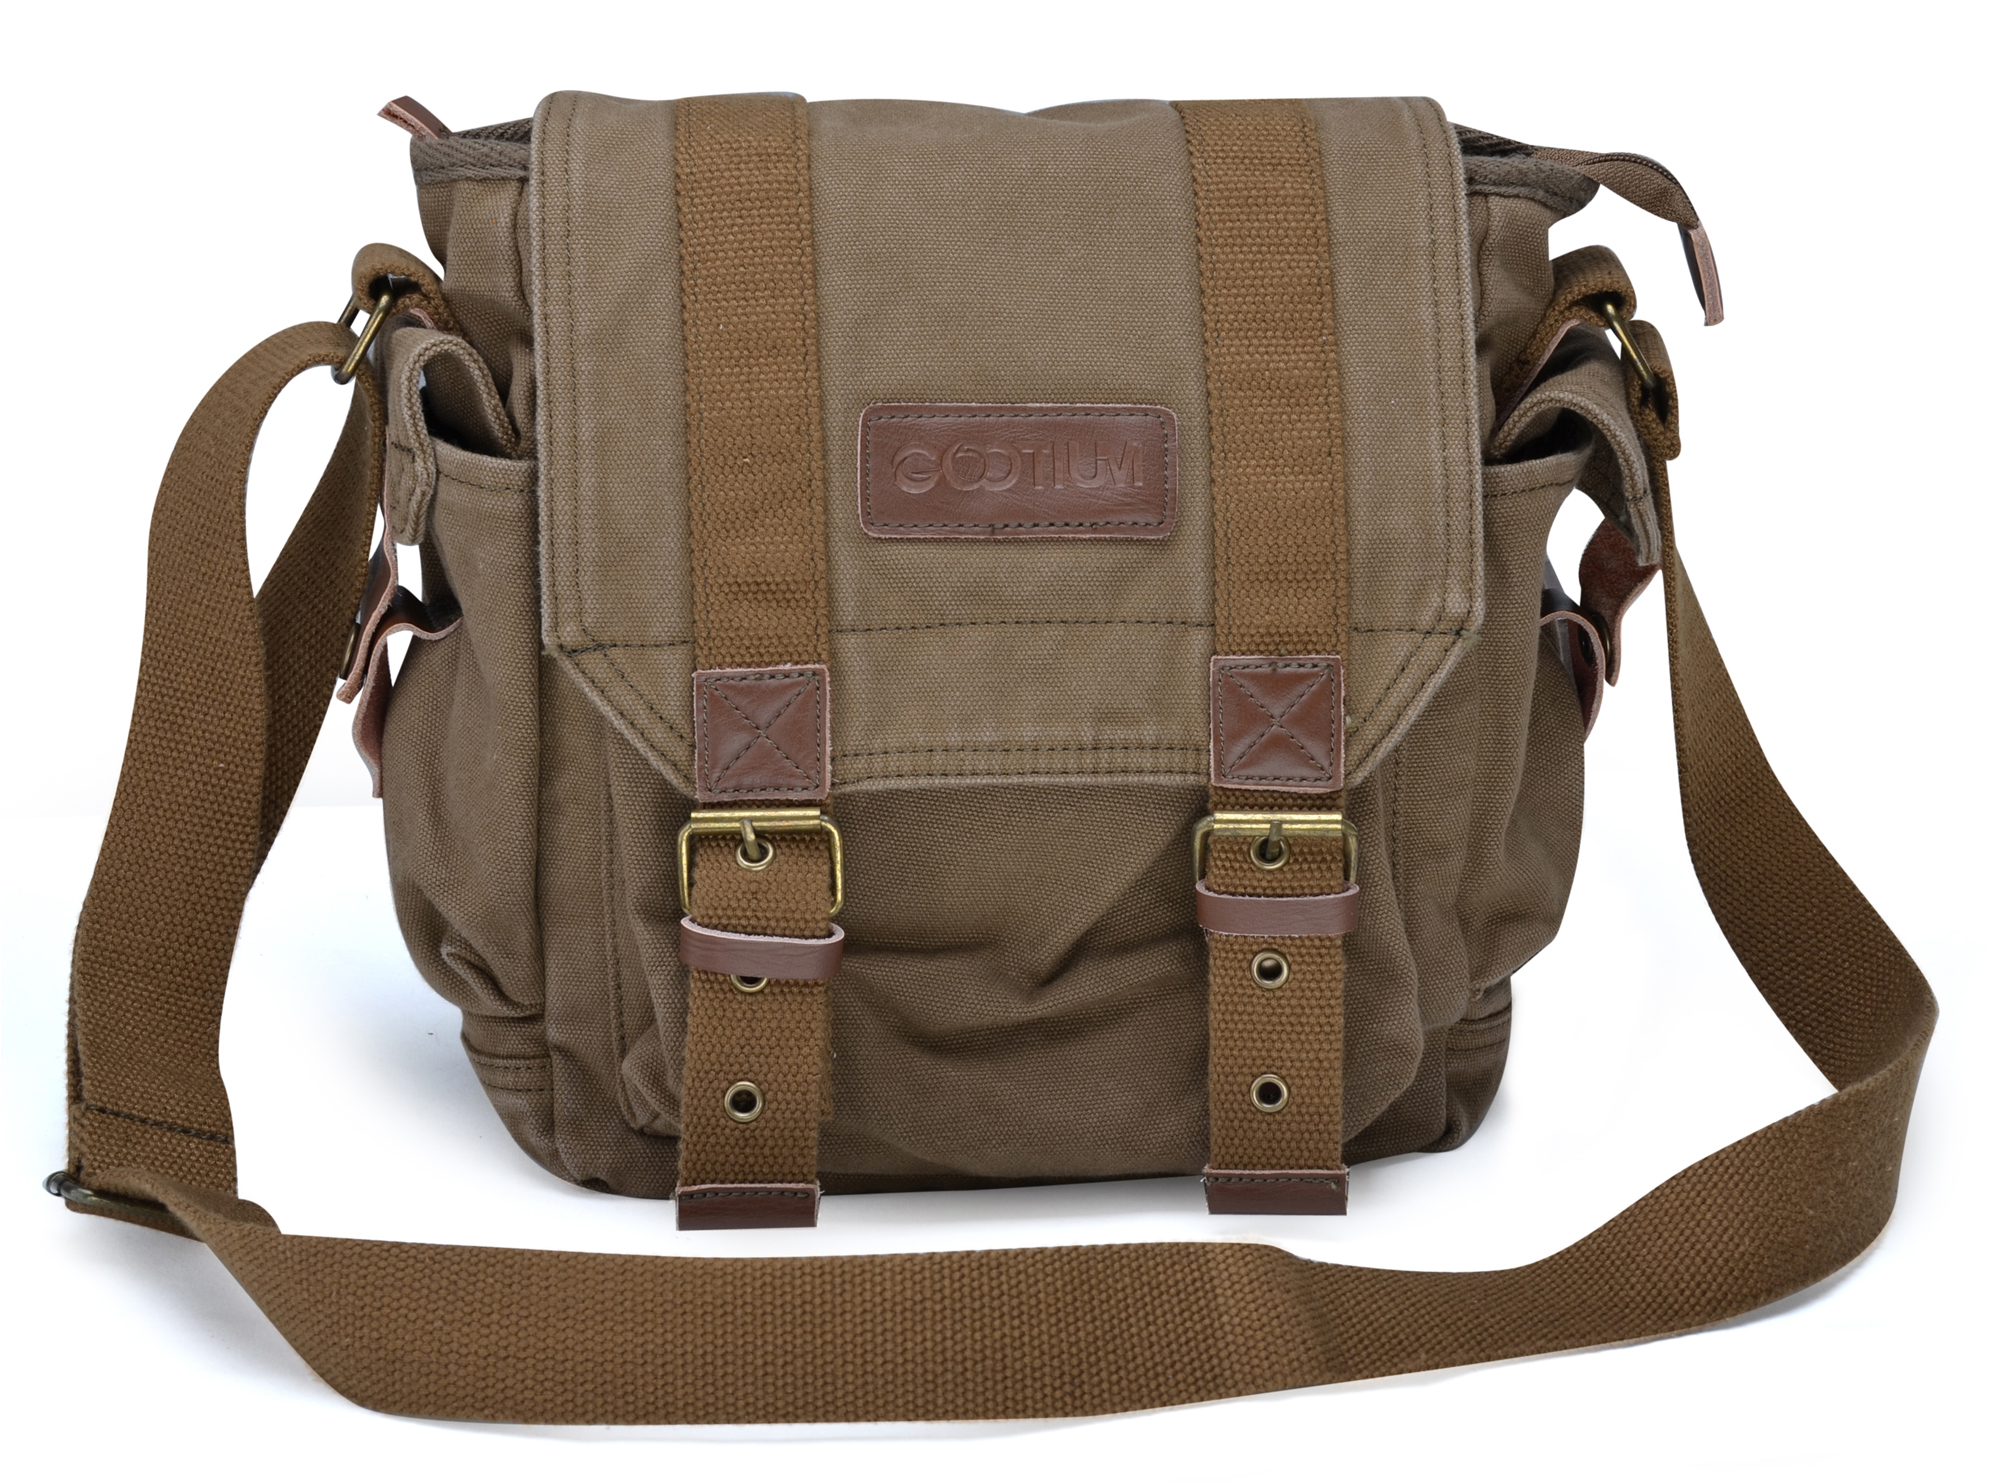 Gootium Vintage Canvas Messenger Bag Men S Shoulder School Satchel Army Green